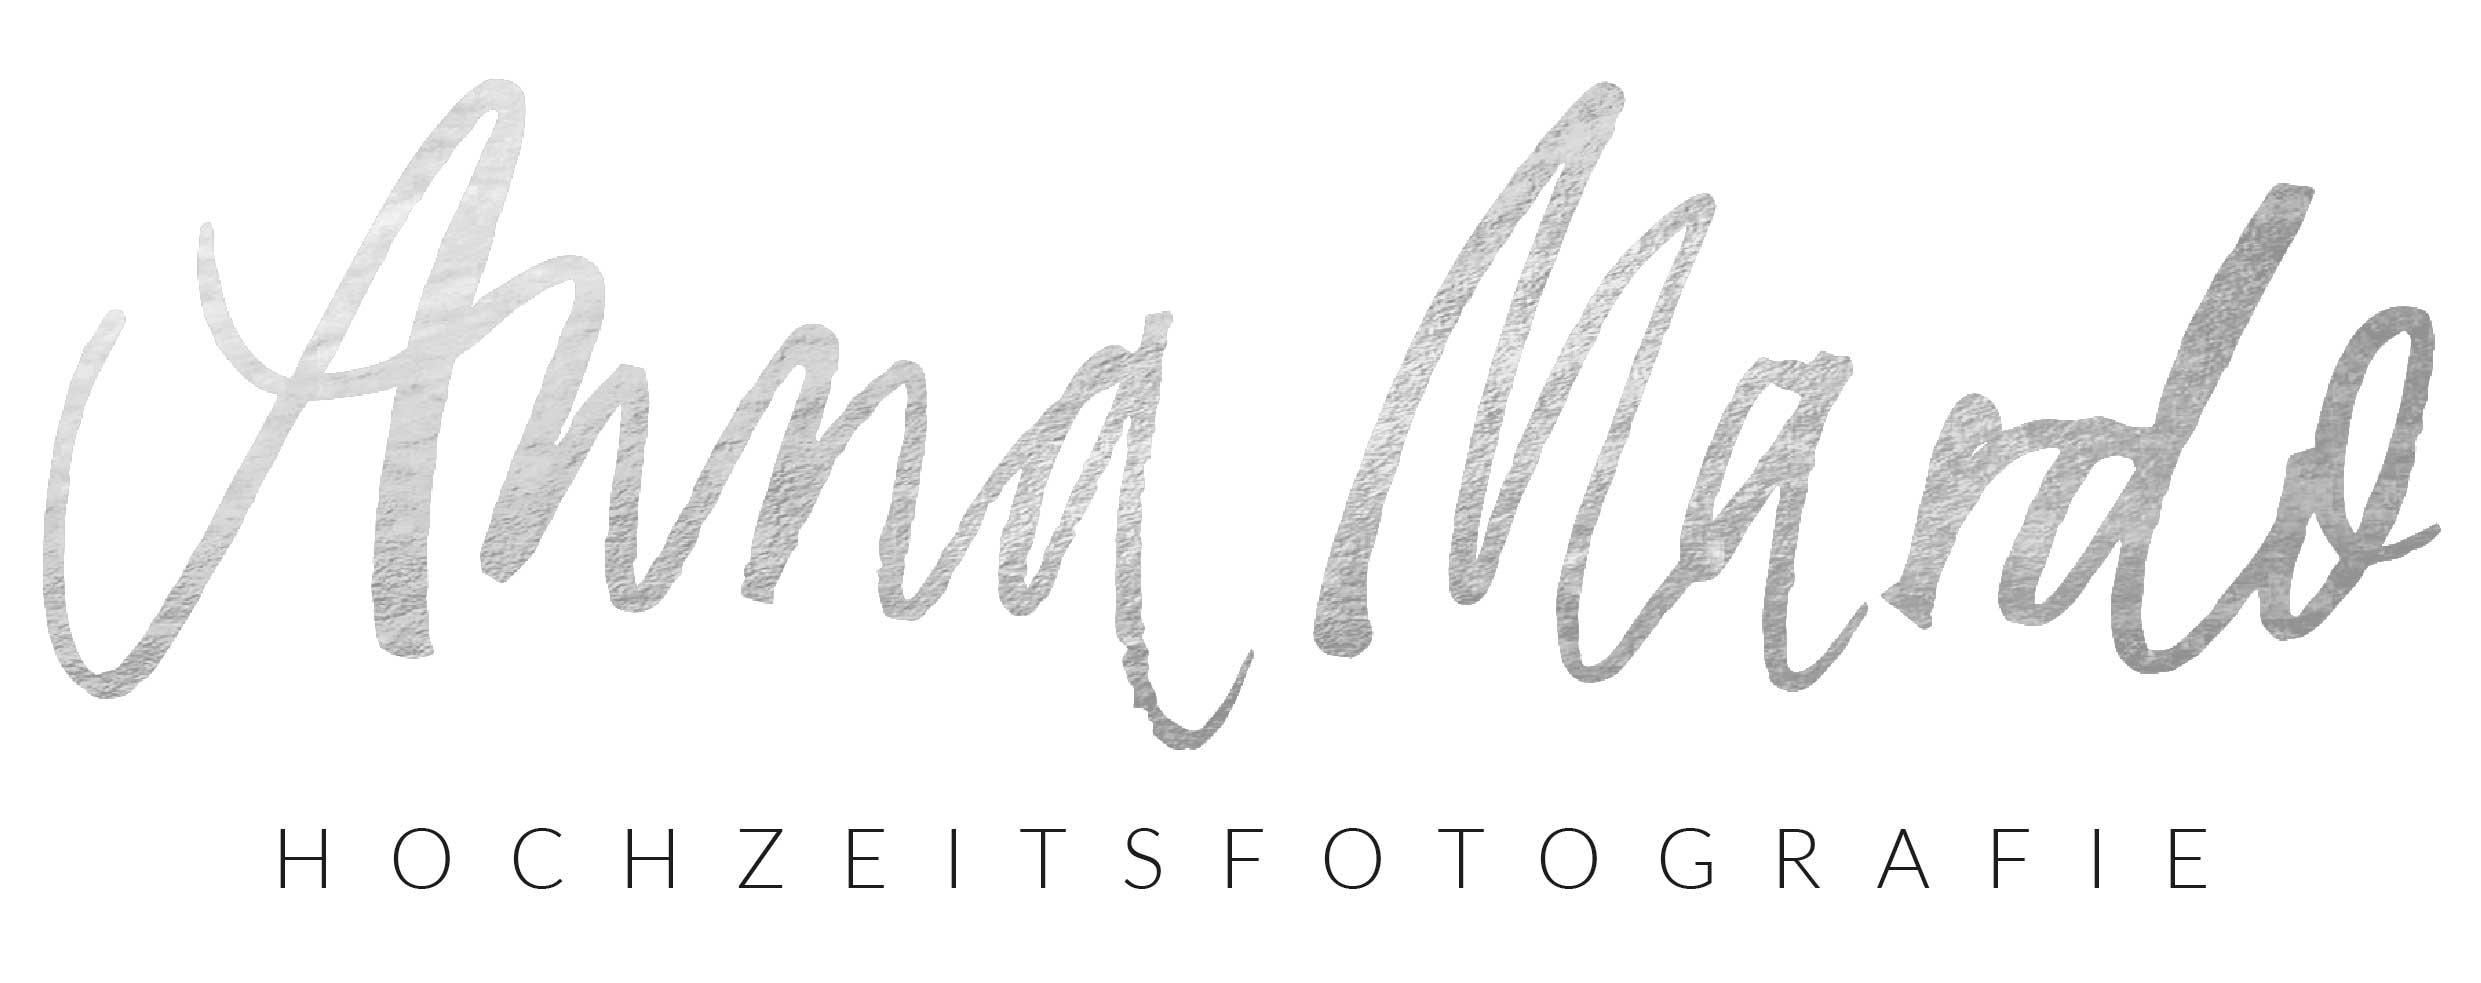 a new custom hand lettered logo in silver for Anna Mardo Fotografie